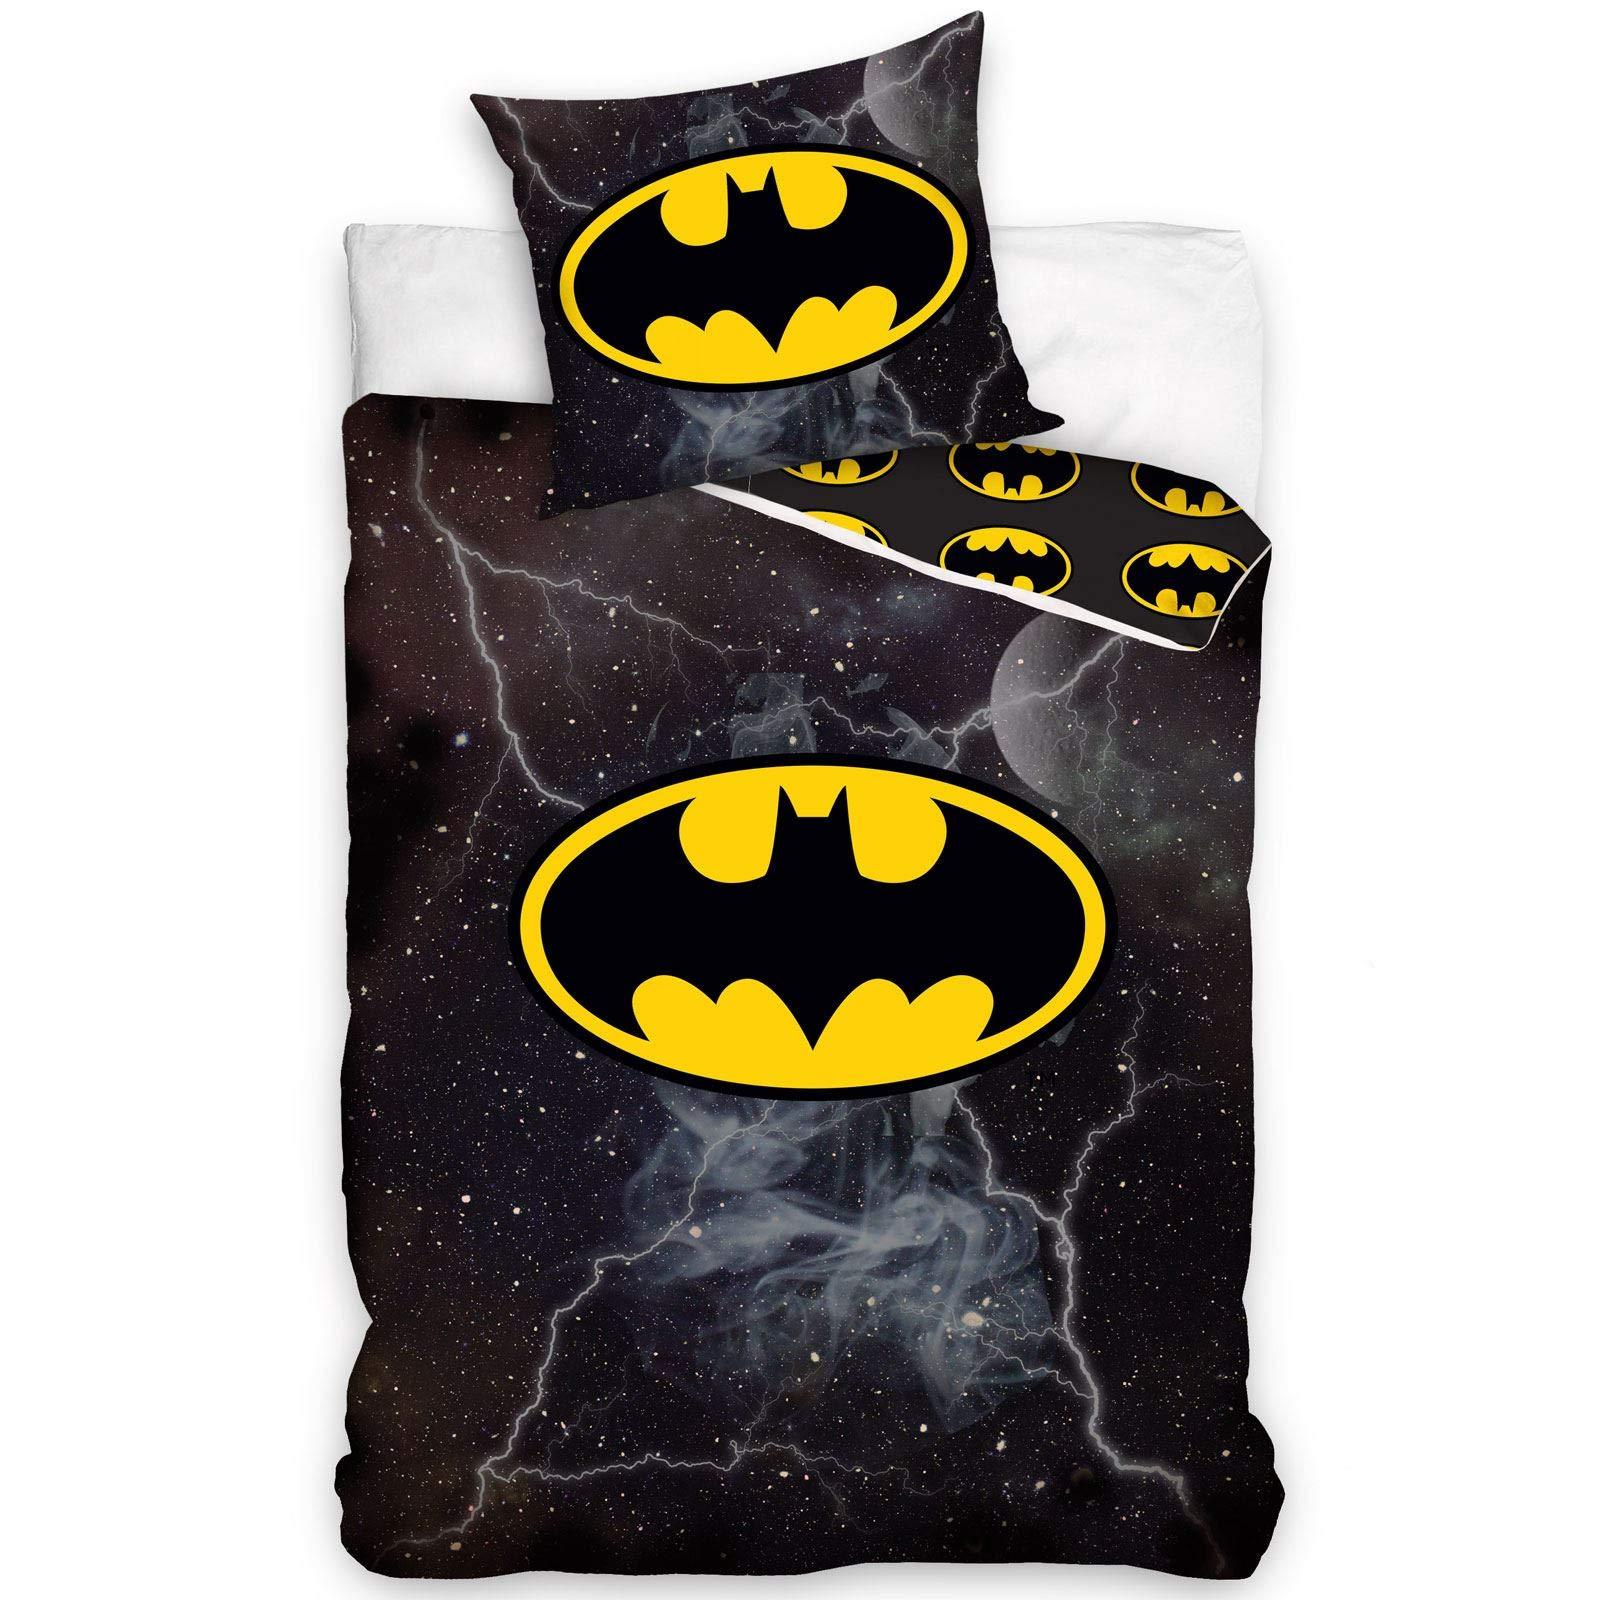 Batman Knight Hero Pillowcase Kids Pillowcase Reversible Design